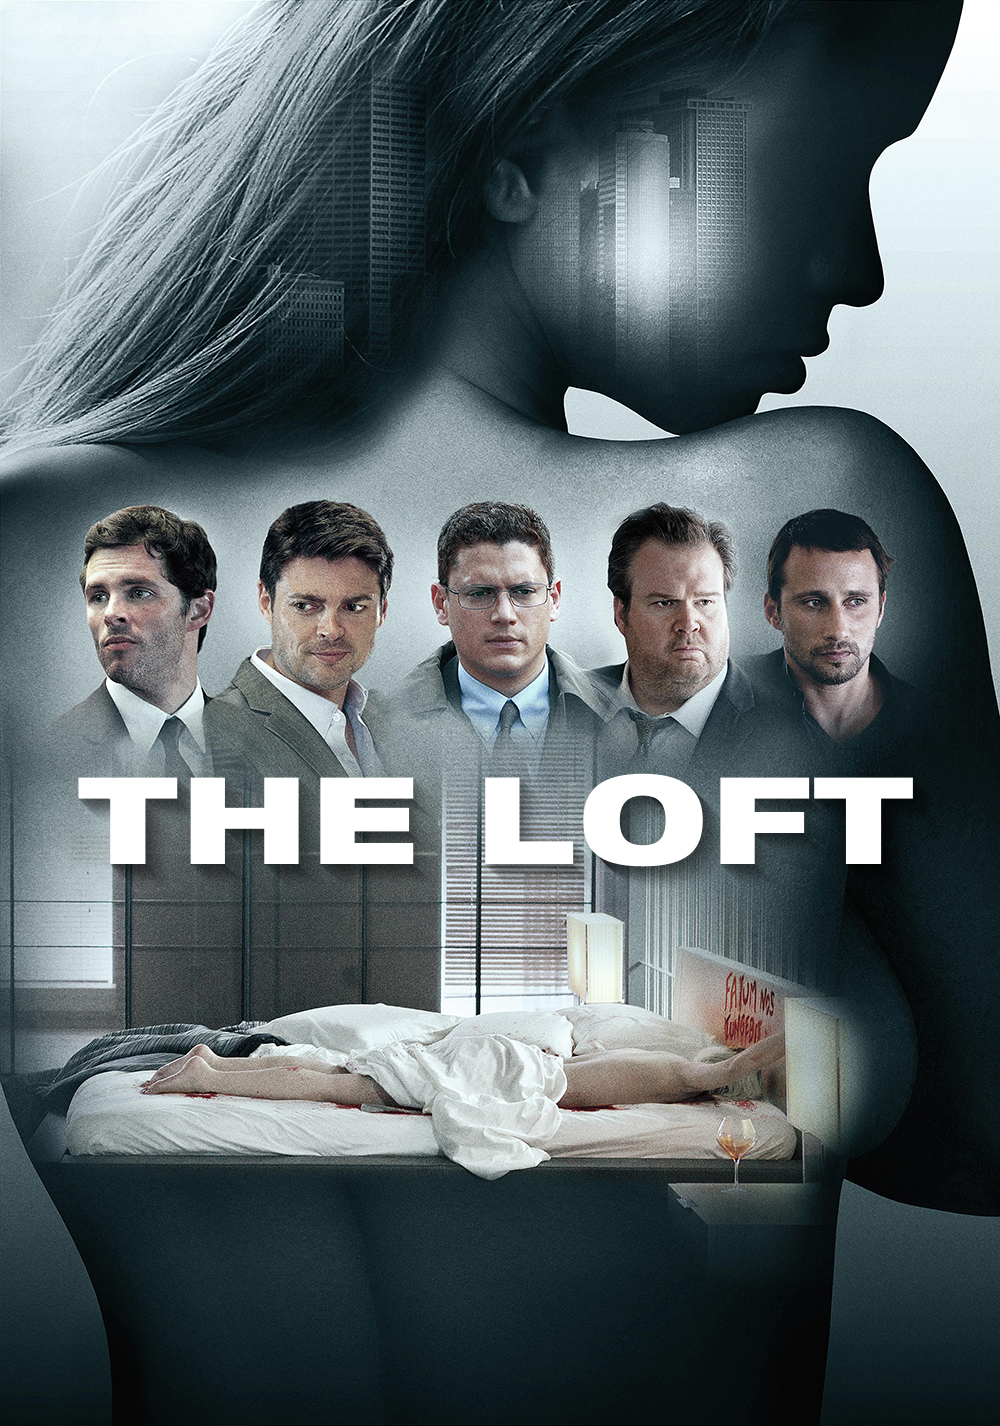 the loft 2014 movie streaming. Black Bedroom Furniture Sets. Home Design Ideas